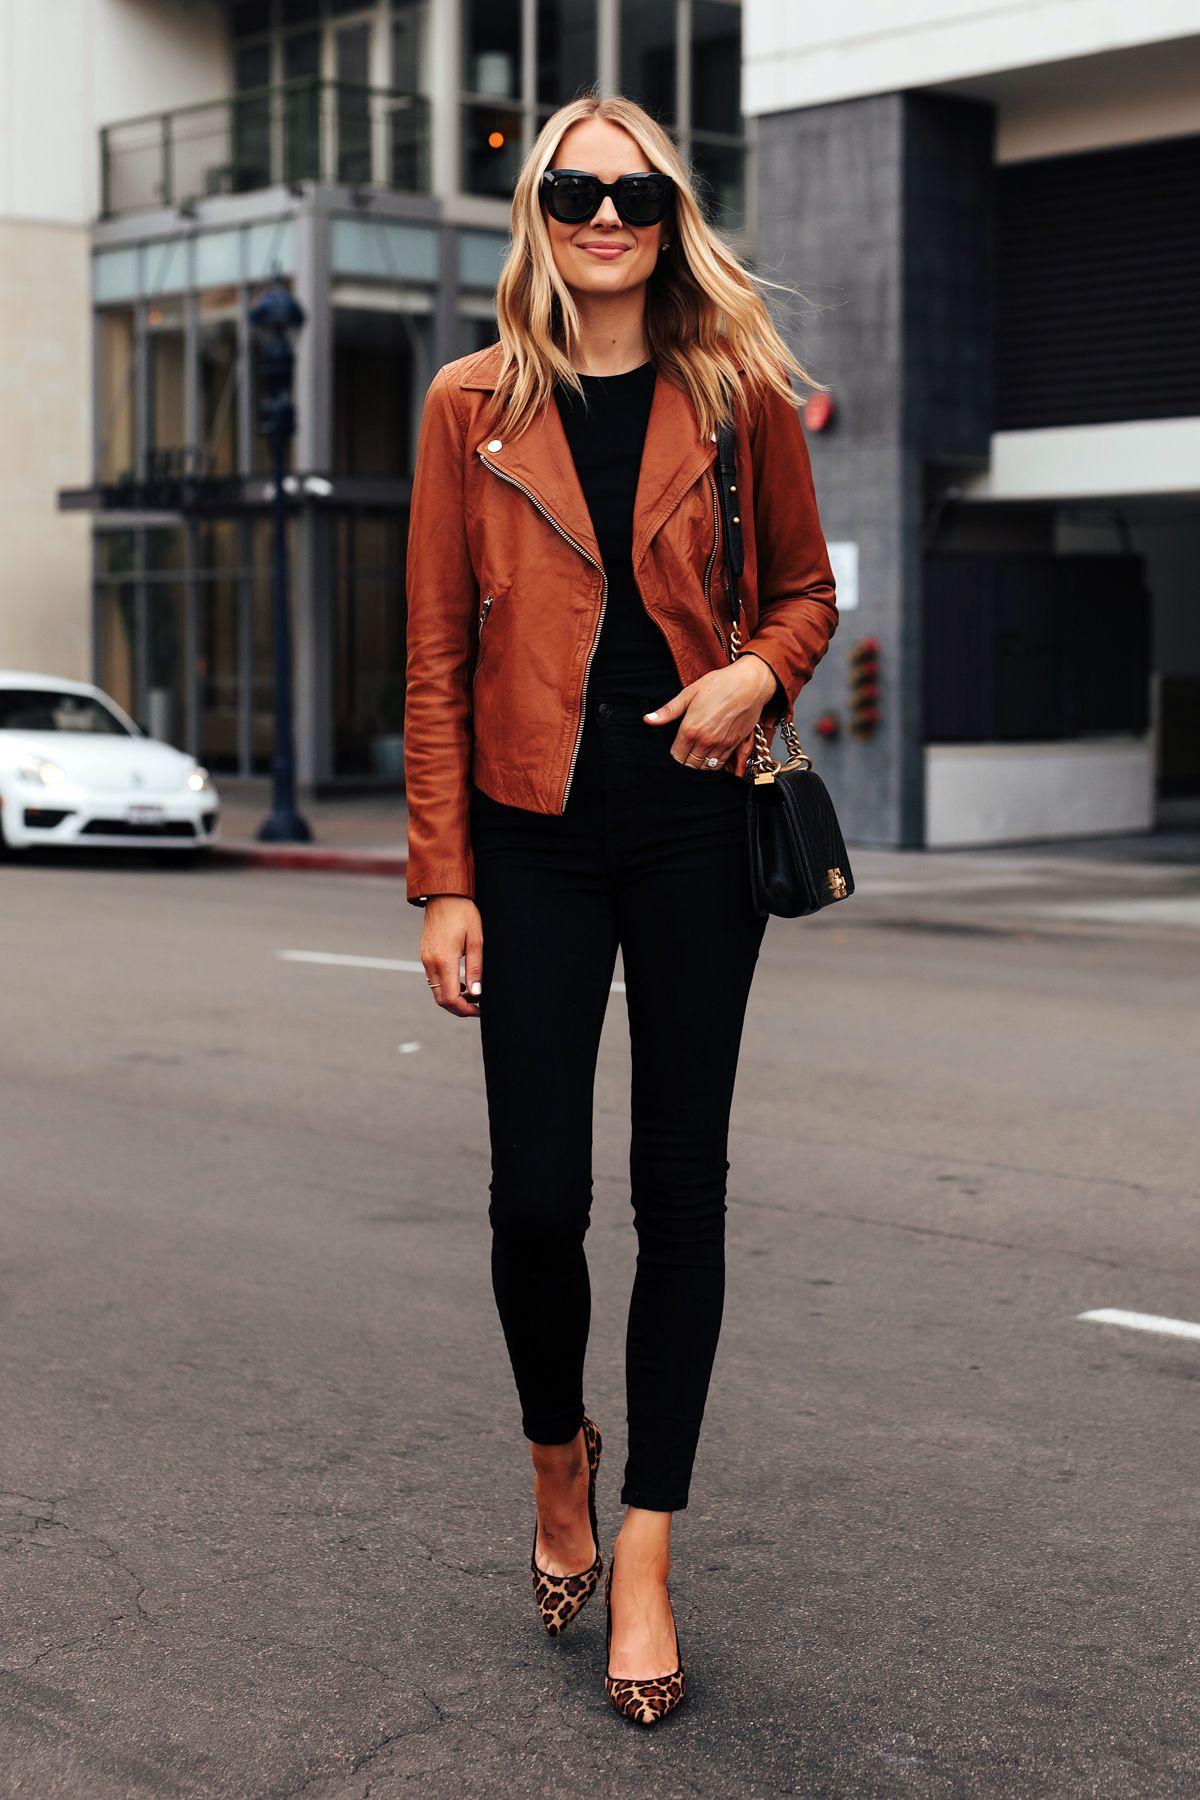 Fashion Jackson Wearing Madewell Tan Leather Jacket Black Tshirt Black Skinny Jeans Leopard Pumps Chanel Black H Fashion Jackson Leather Jacket Outfits Fashion [ 1800 x 1200 Pixel ]